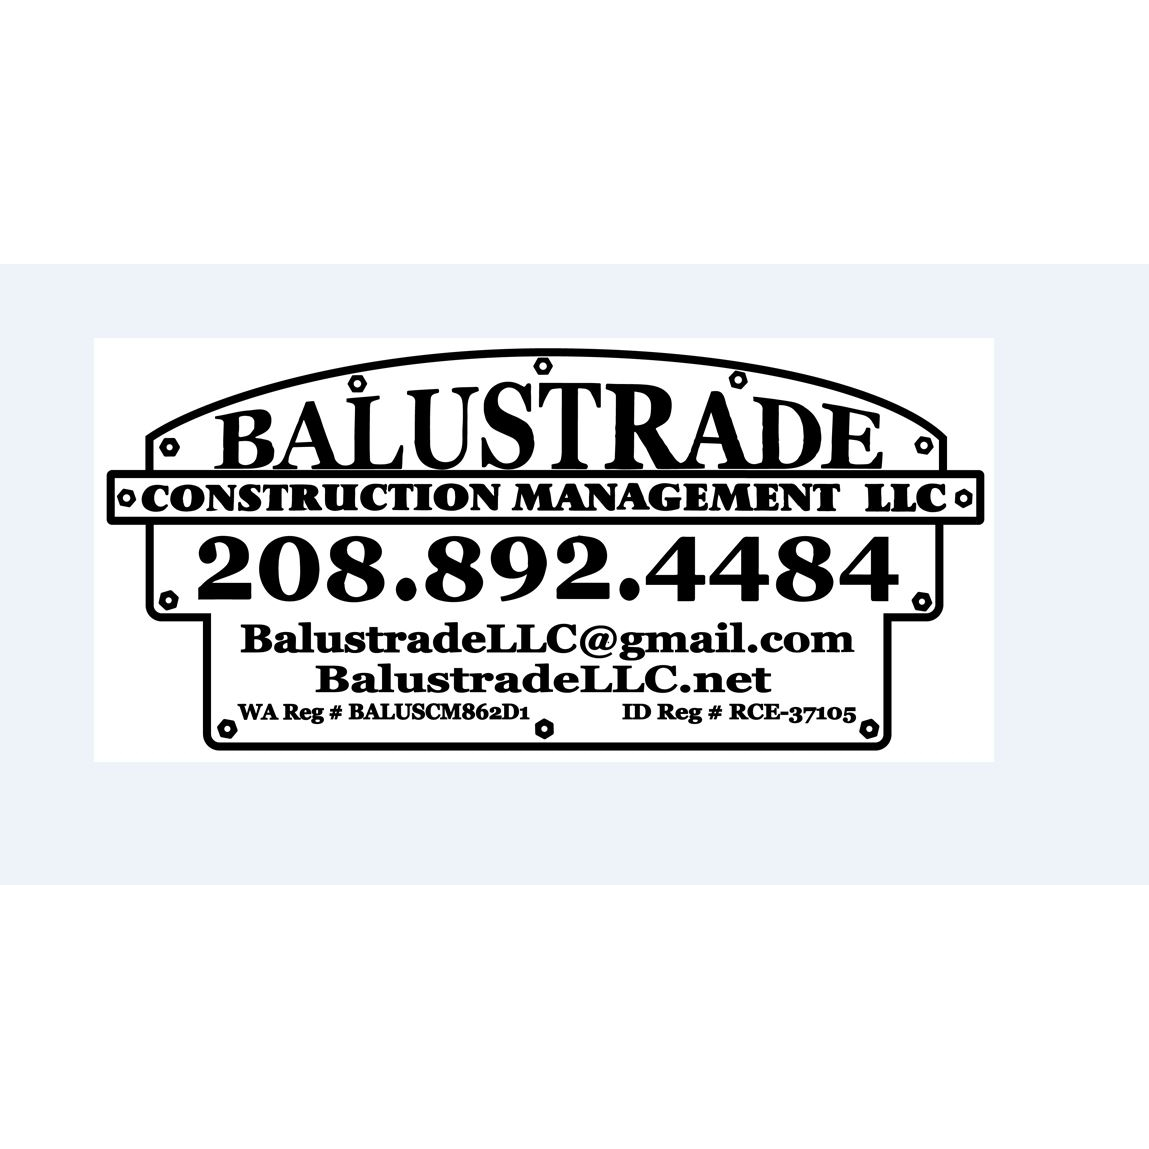 Balustrade Construction Management LLC